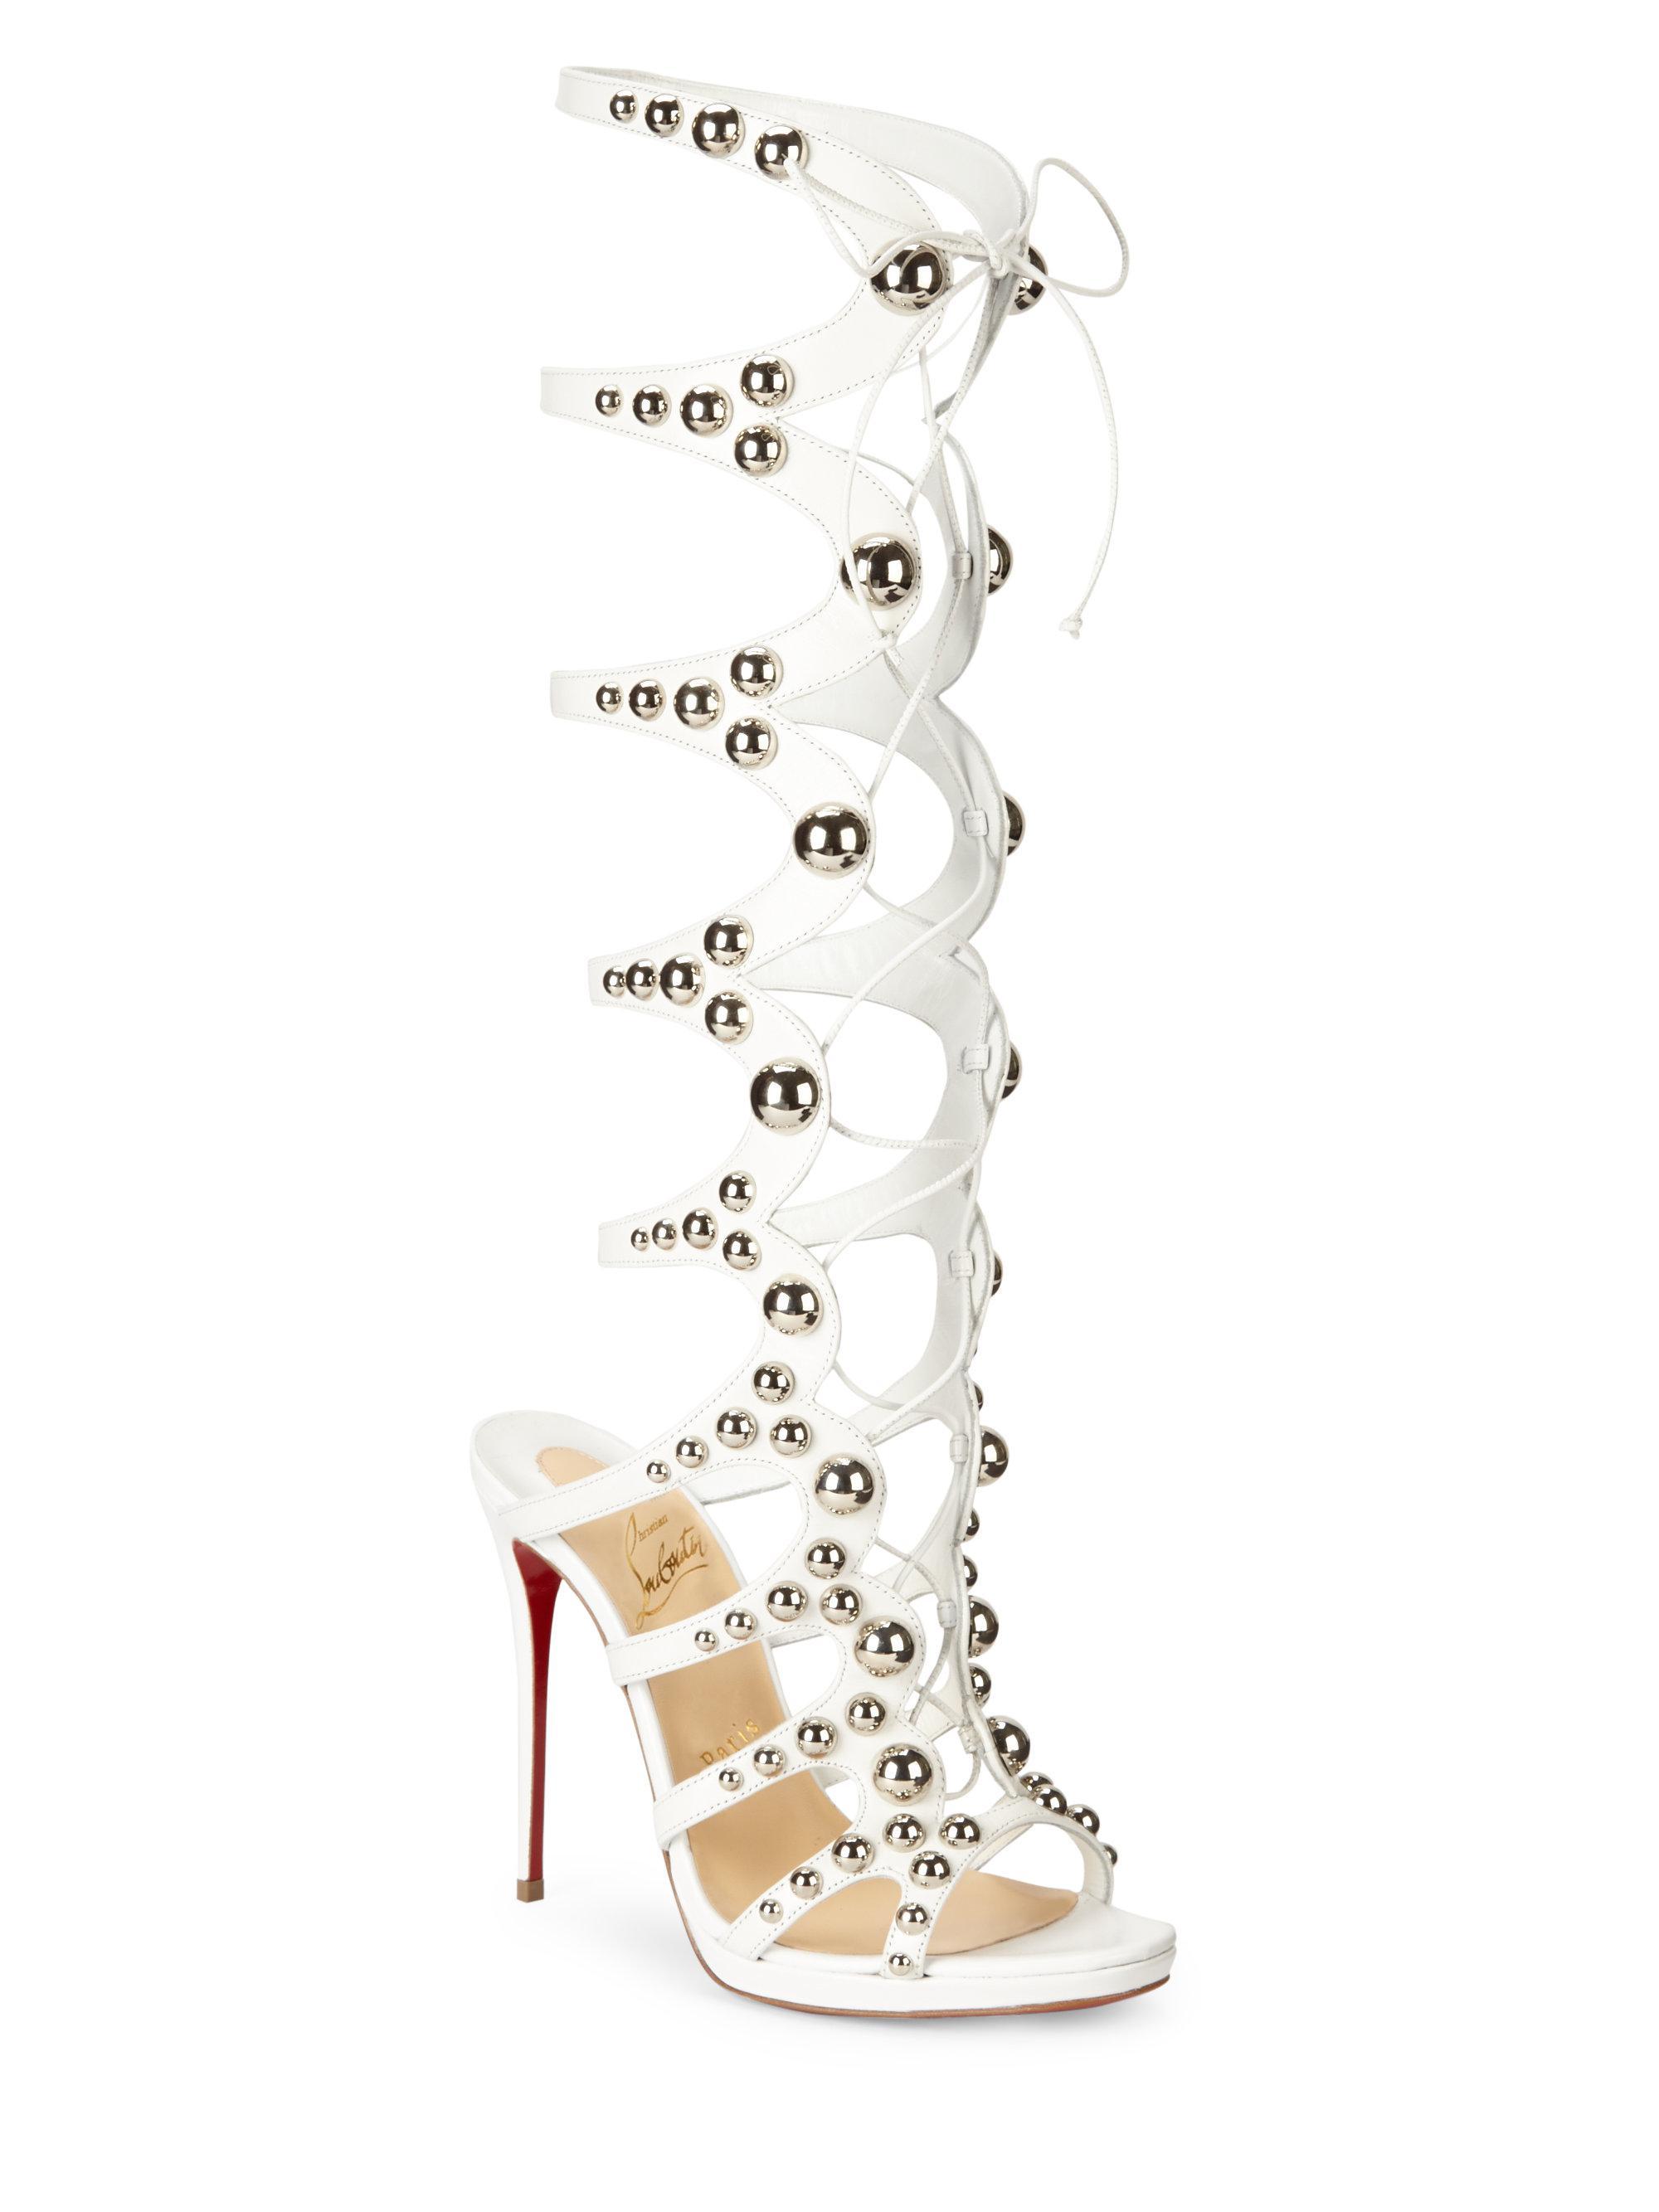 22c8068ff8c4 Christian Louboutin Amazoutiful Knee-high Leather Gladiator Heels in ...